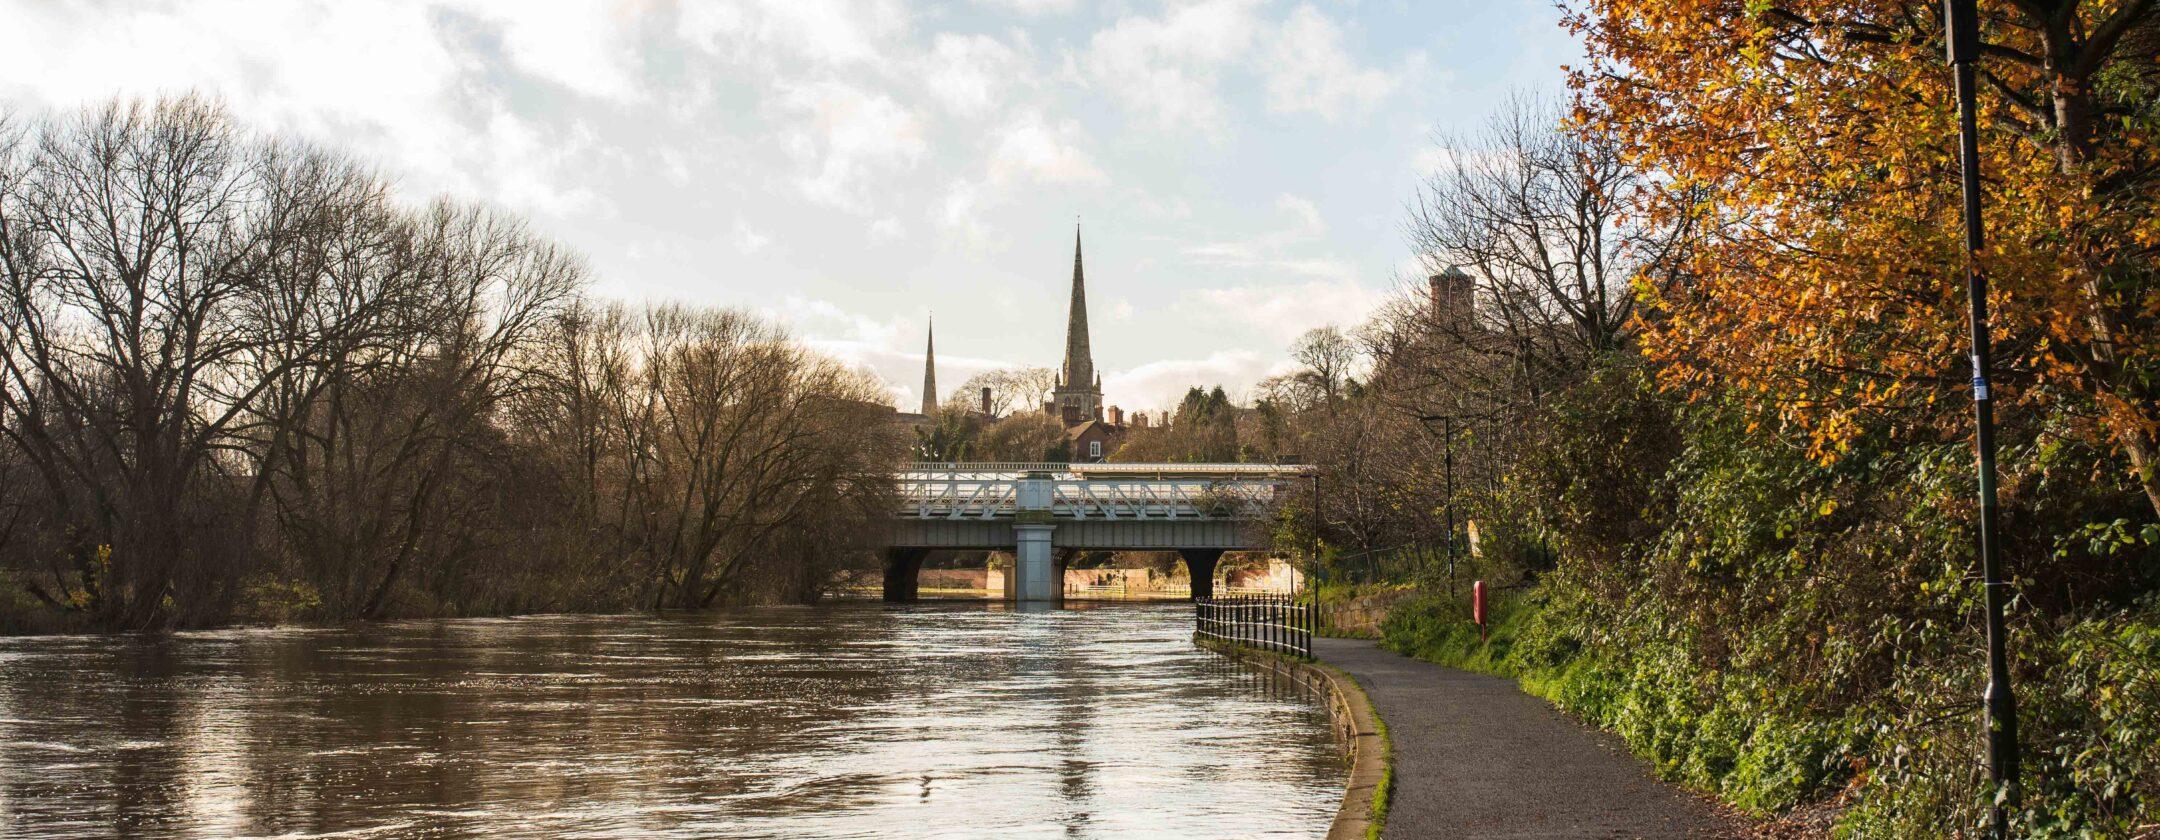 Exploring Shrewsbury - Cornovii Homes